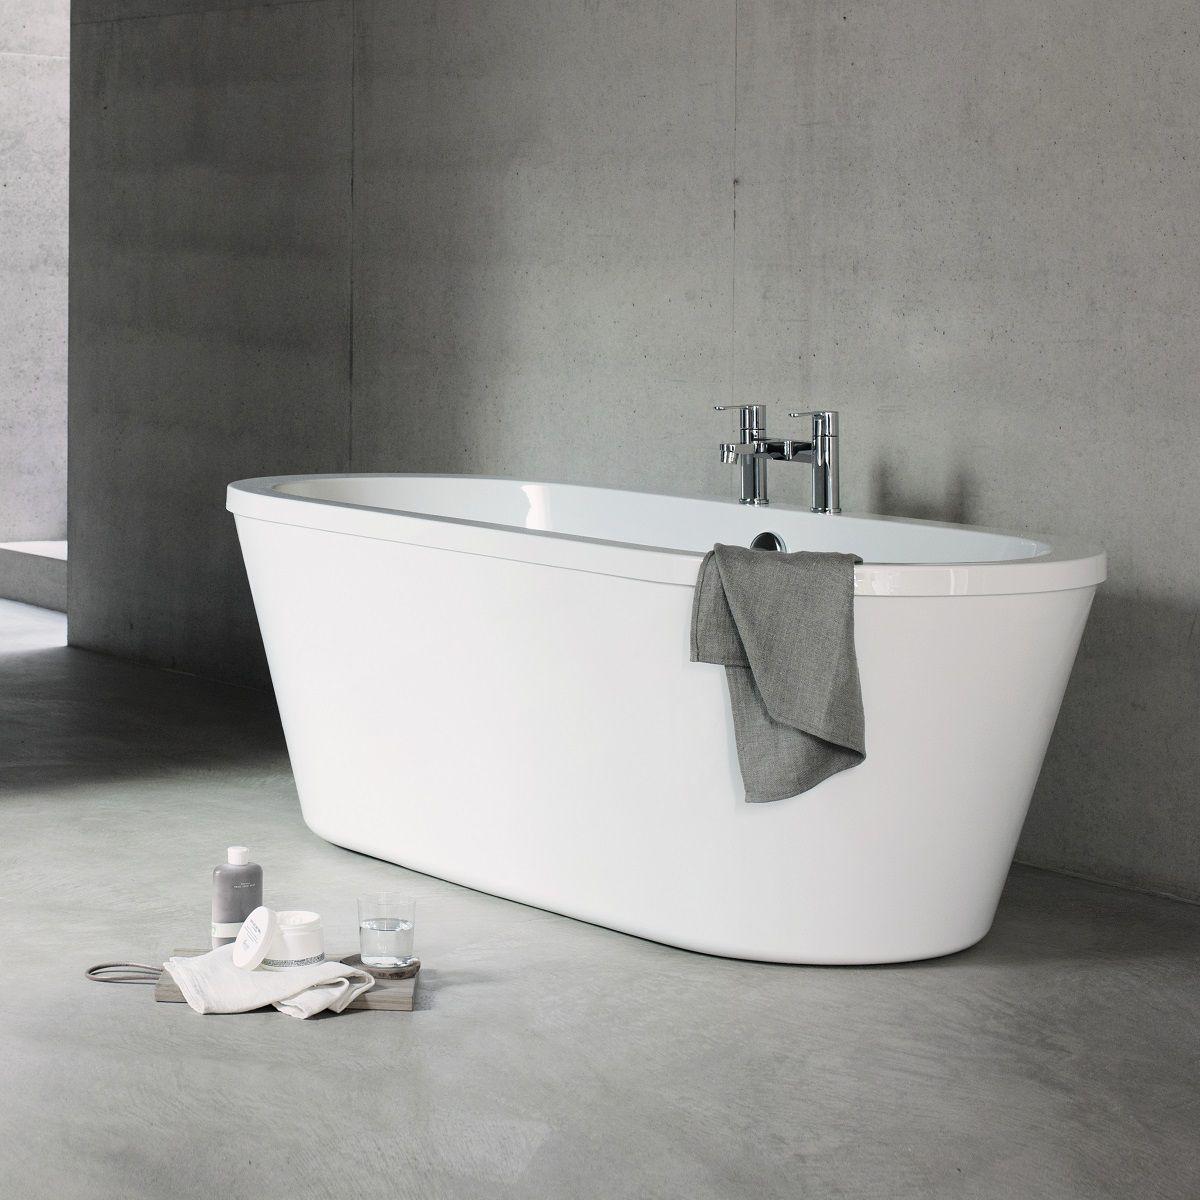 Cleargreen Freestark Double Ended Freestanding Acrylic Bath : UK ...